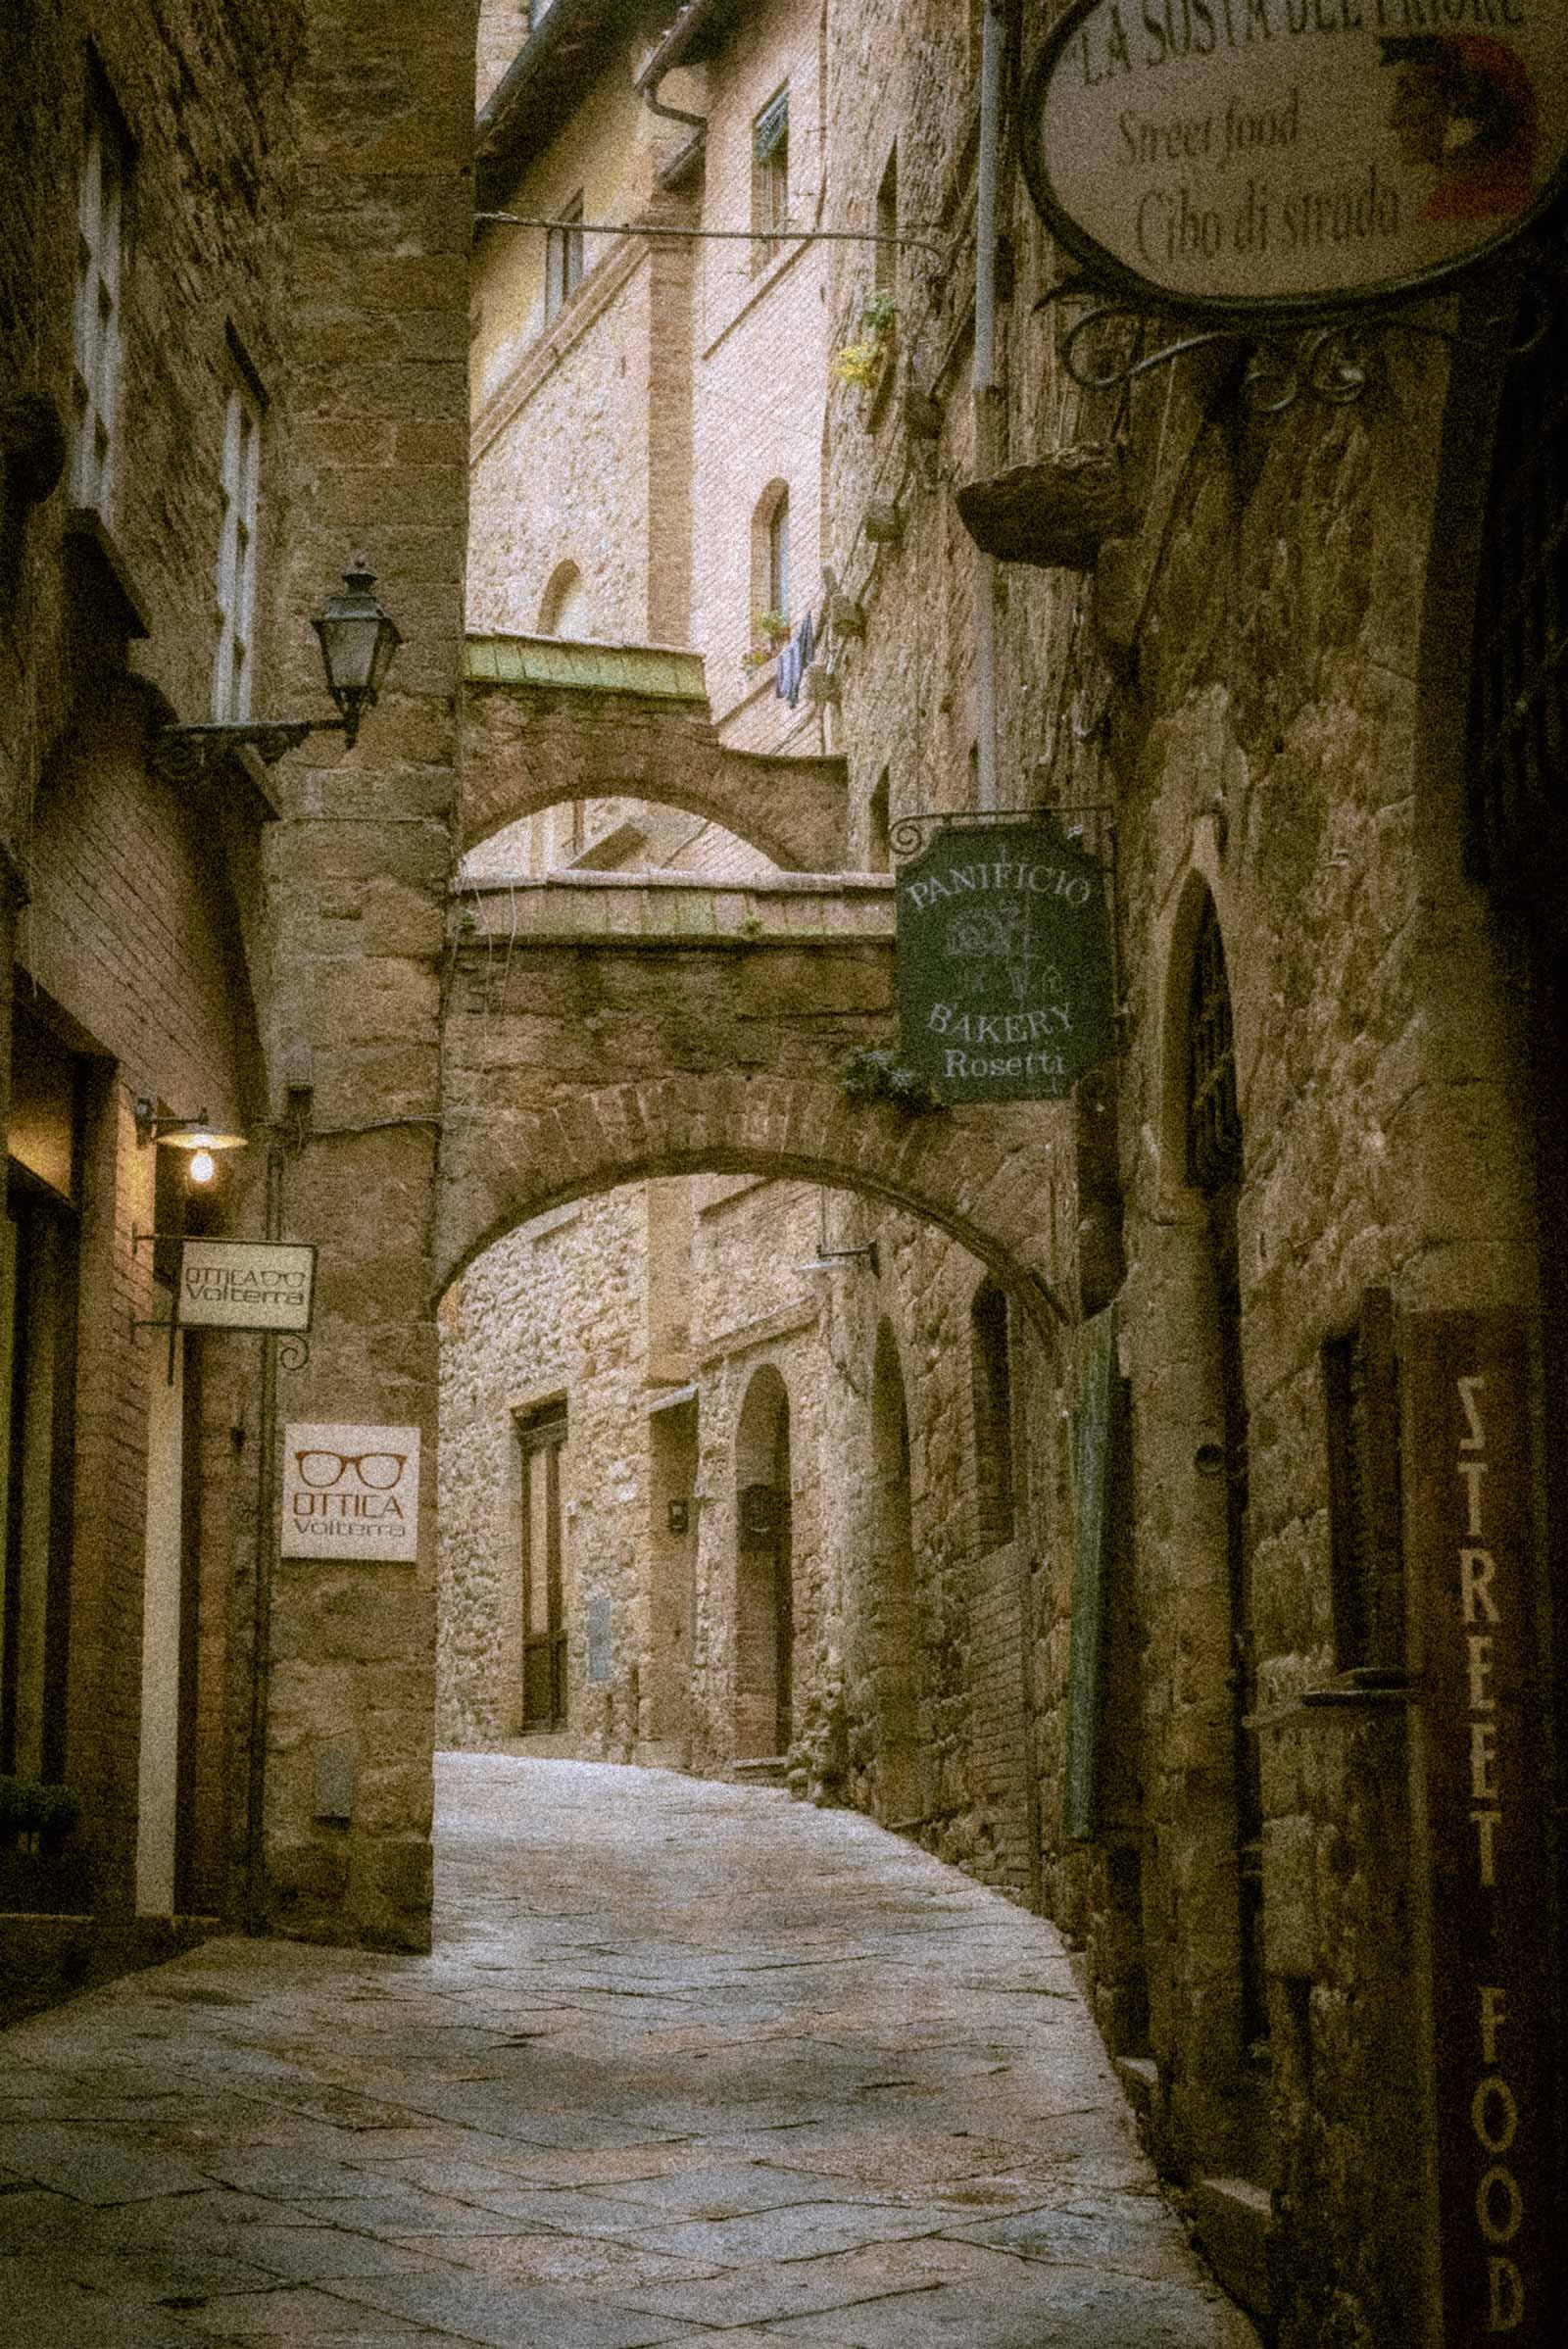 Italian medieval architecture